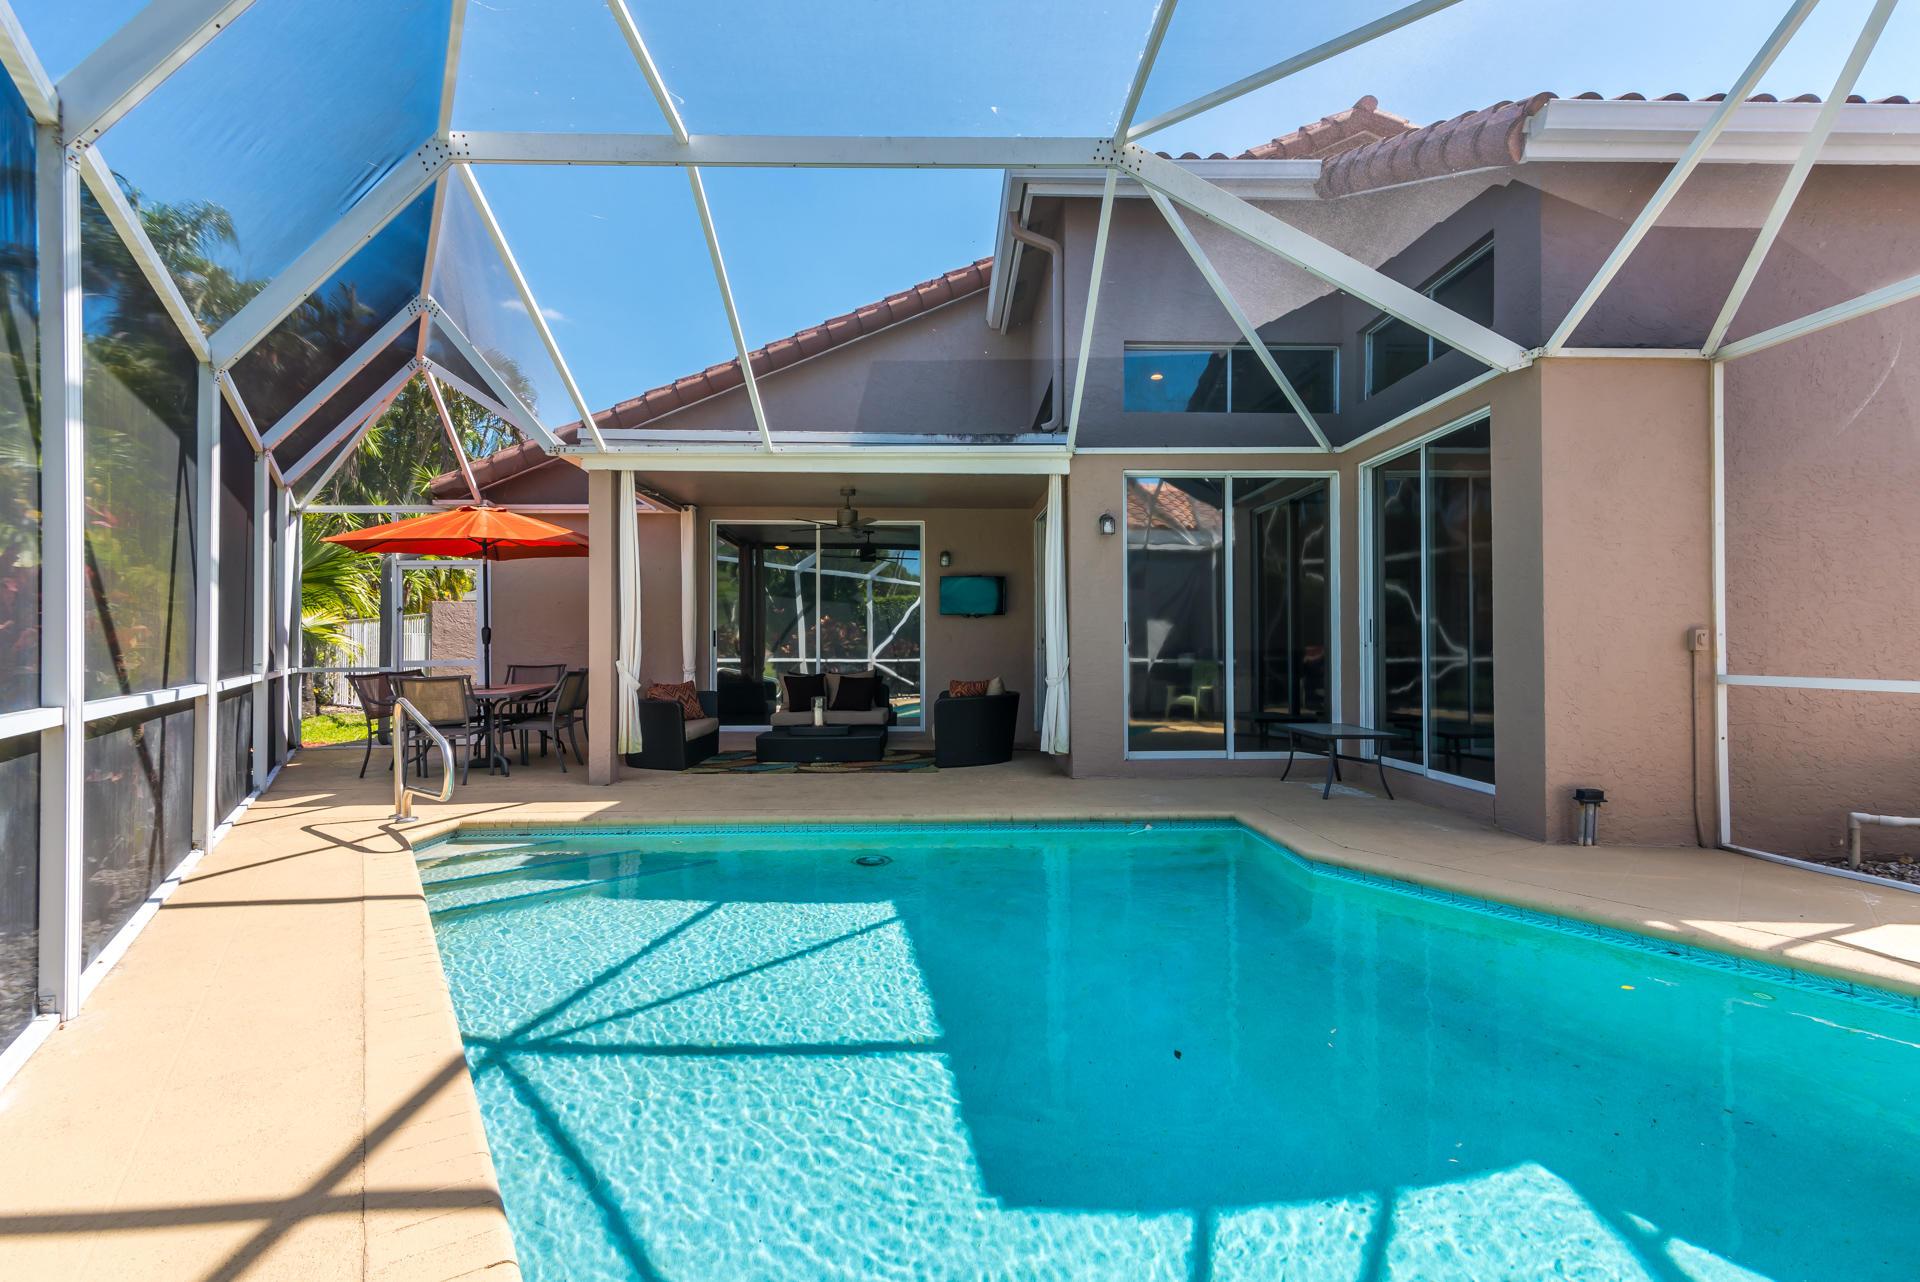 Photo of 17085 Newport Club, Boca Raton, FL 33496